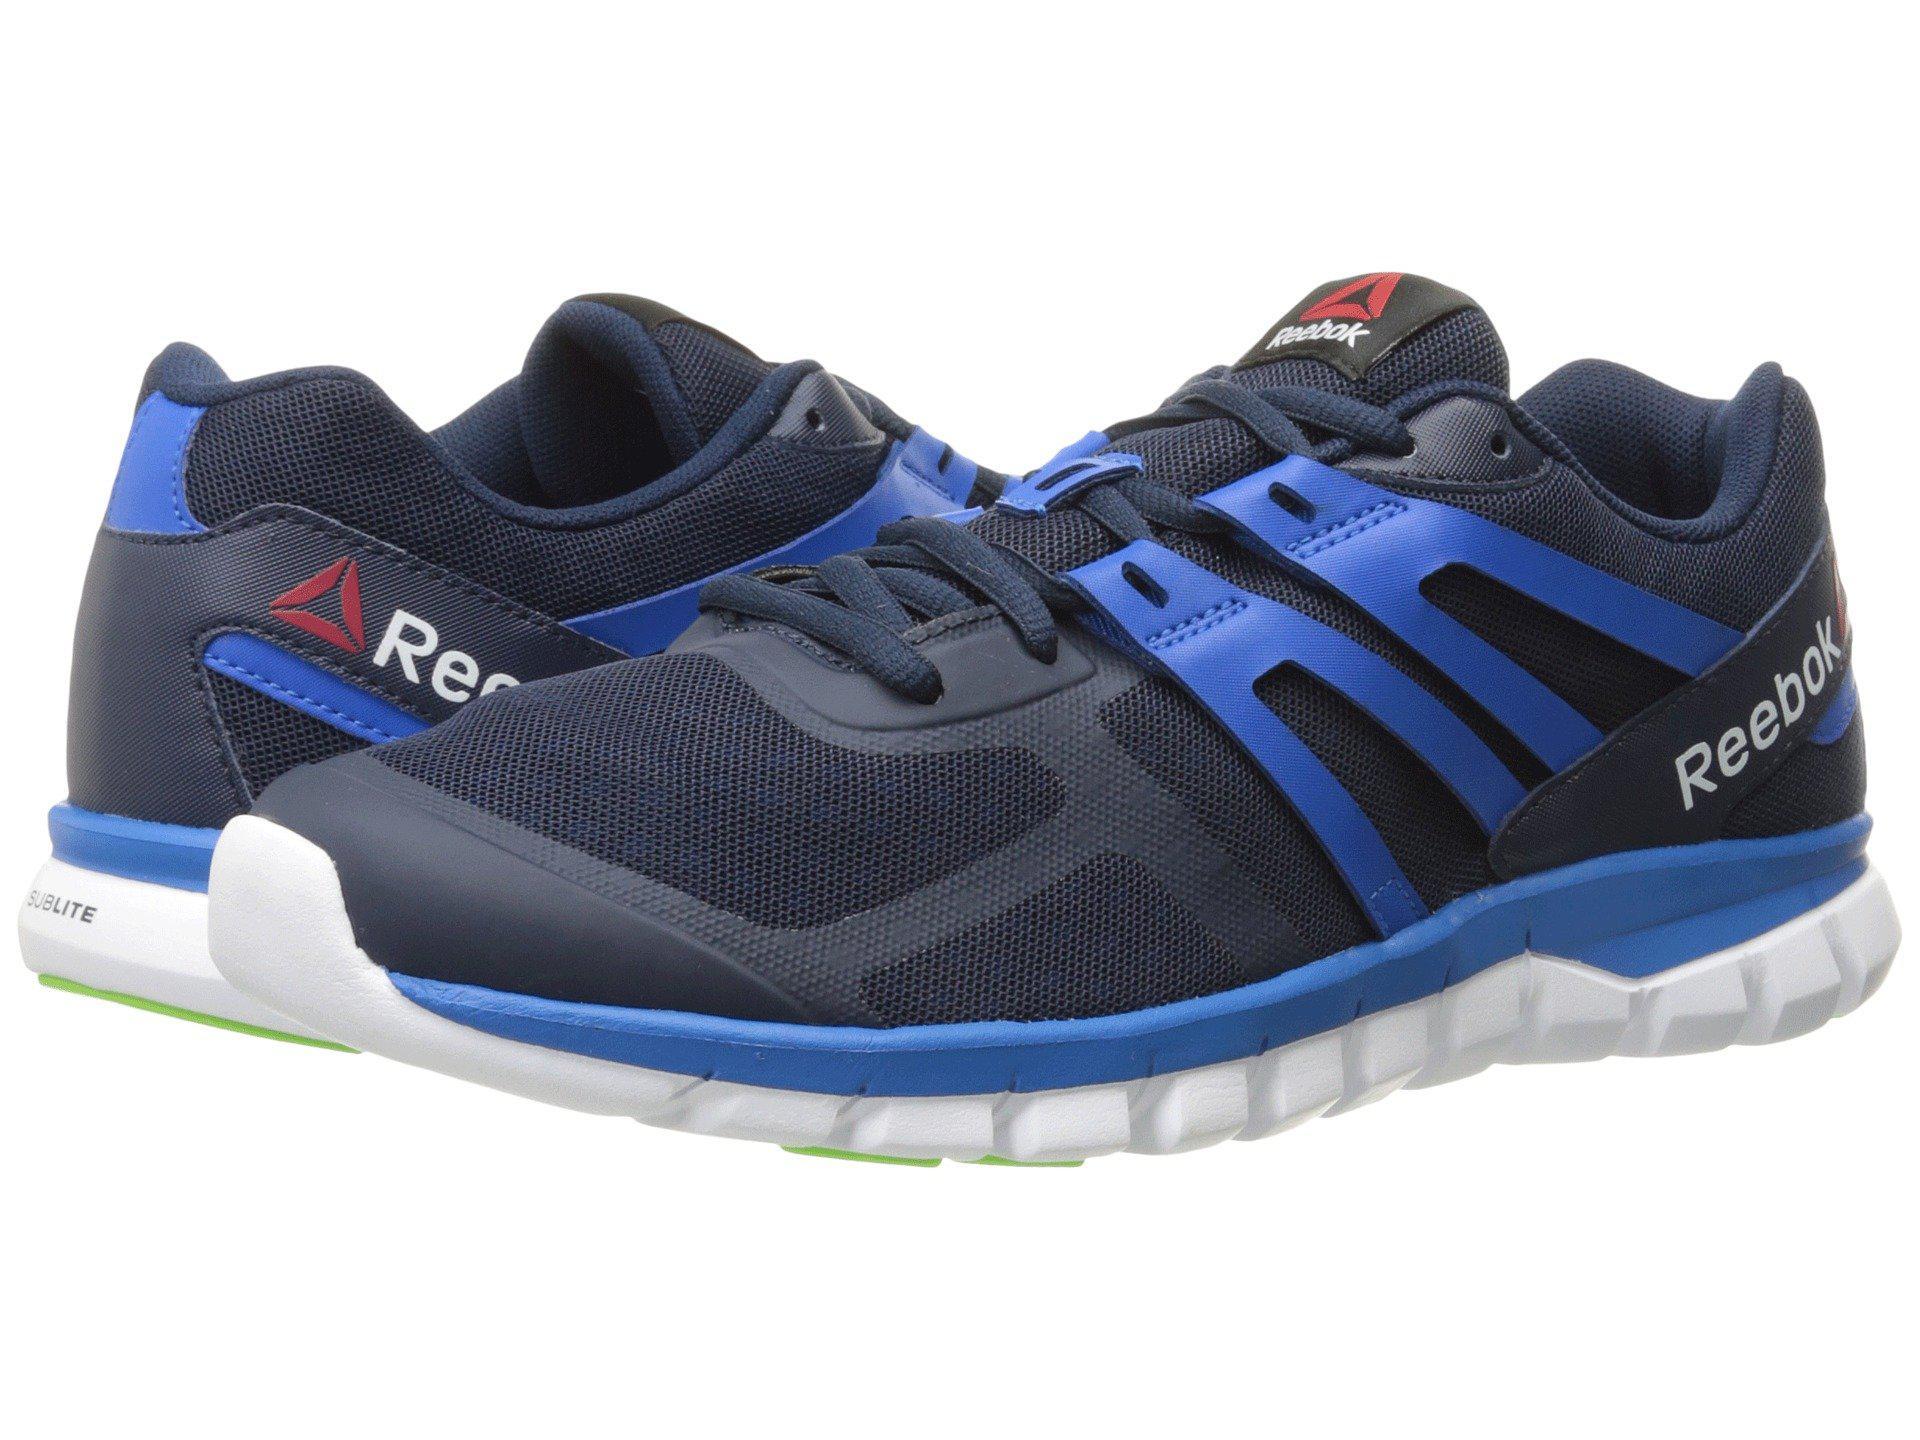 Lyst - Reebok Sublite Xt Cushion Mt Running Shoe in Blue for Men 687f8257a